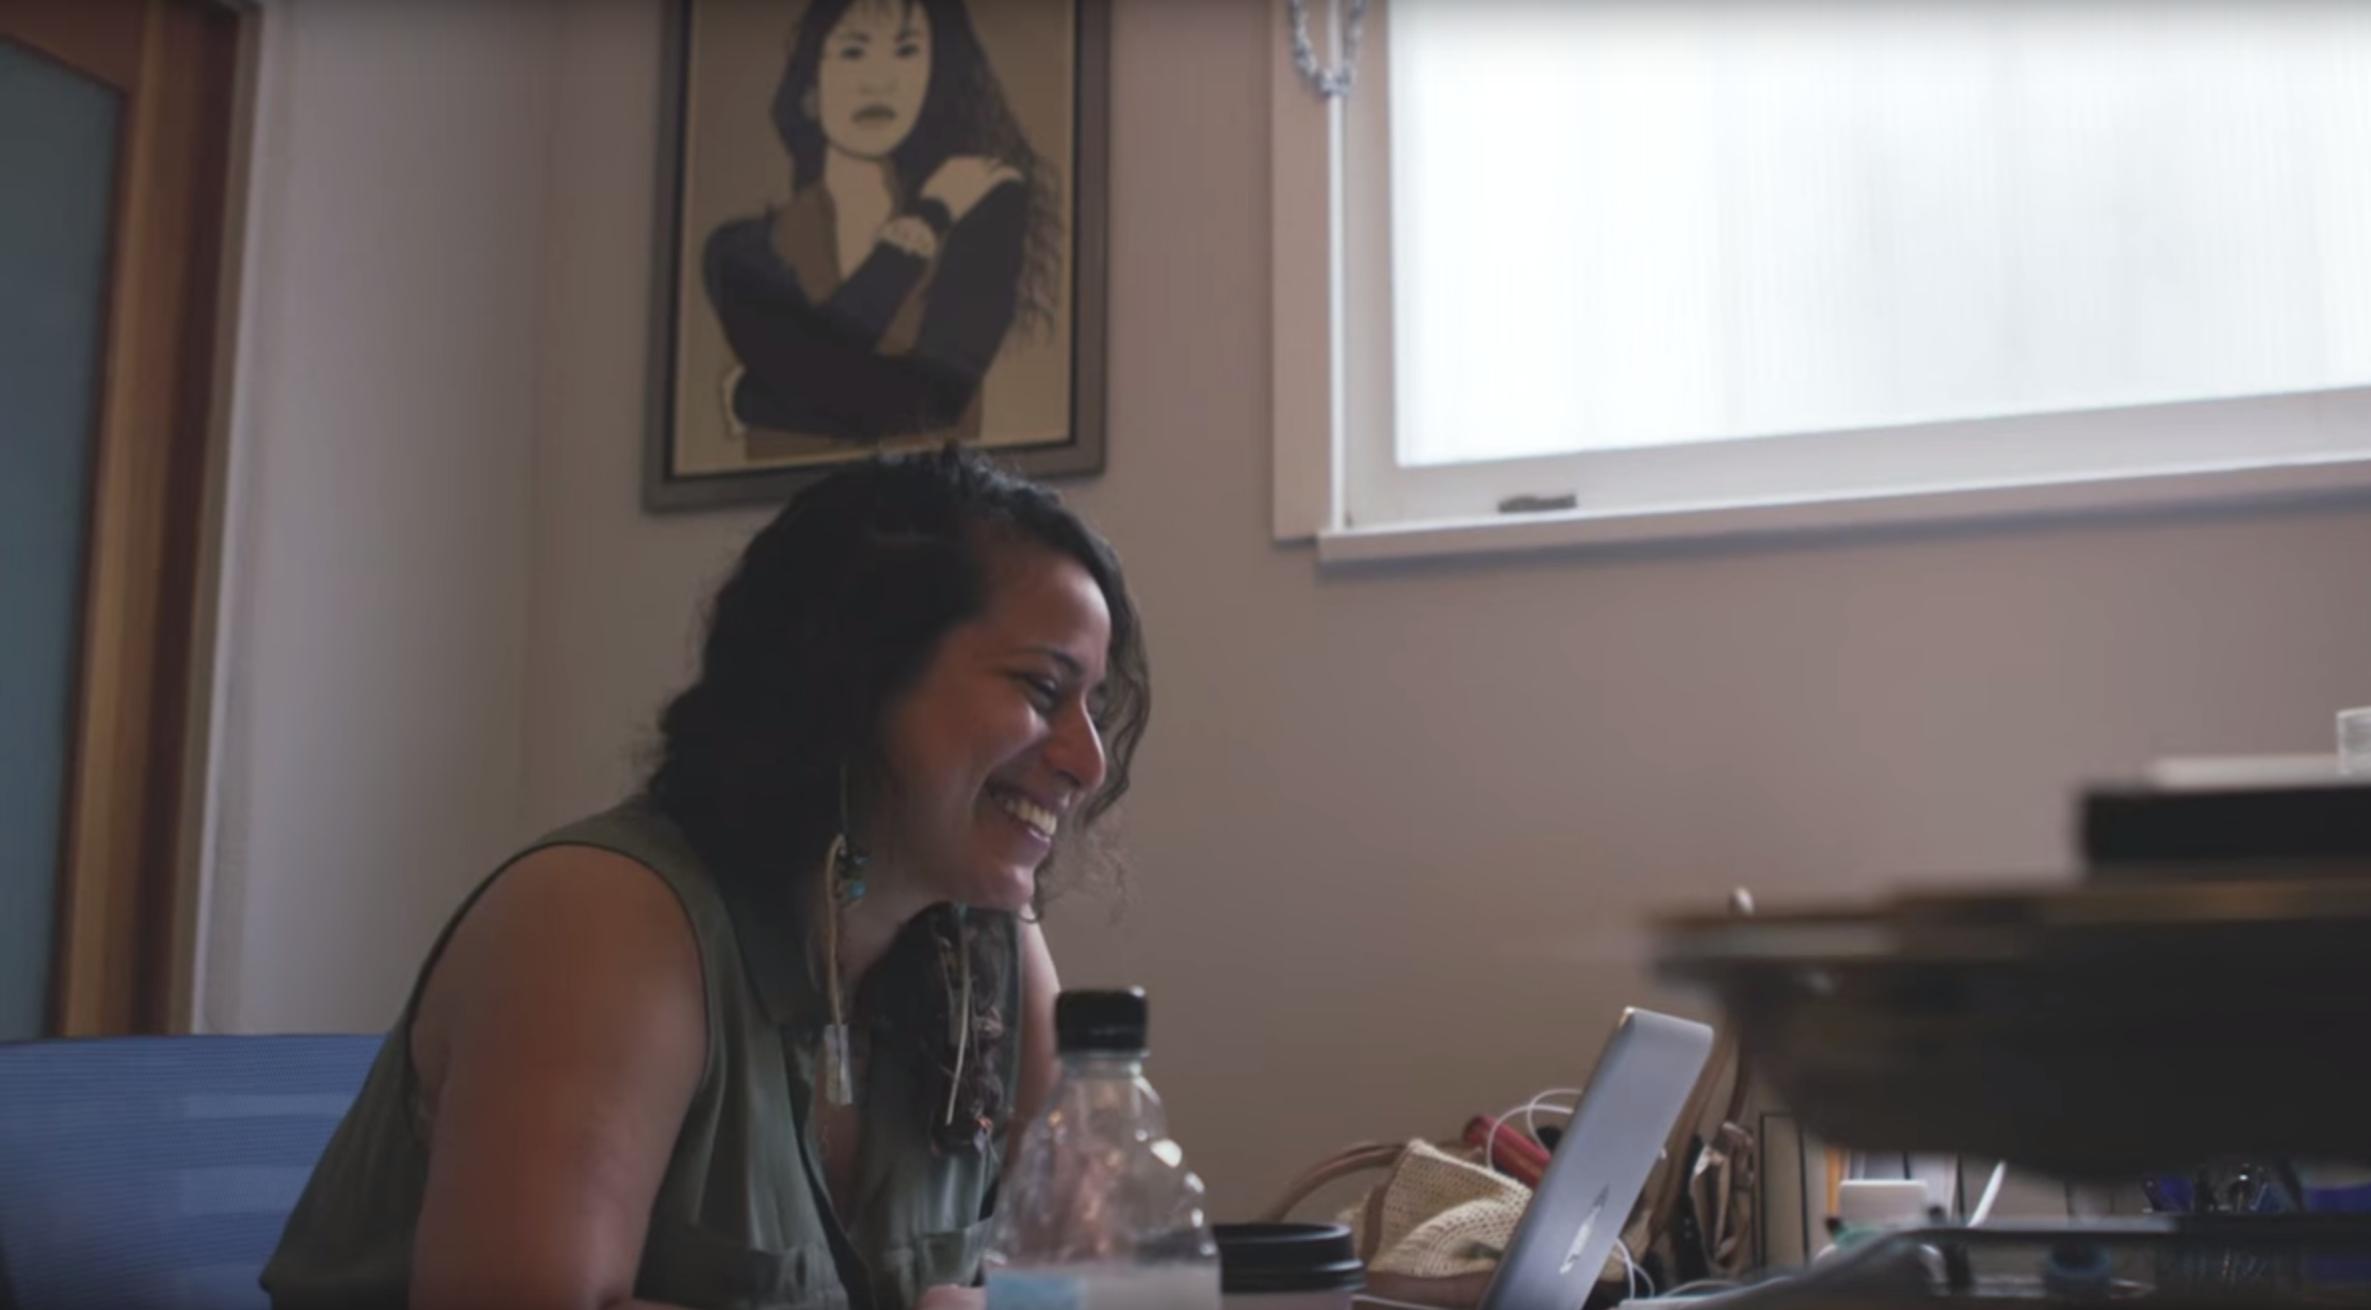 Christine Dávila, Director of Ambulante CA Film Festival, On Elevating Emerging Voices